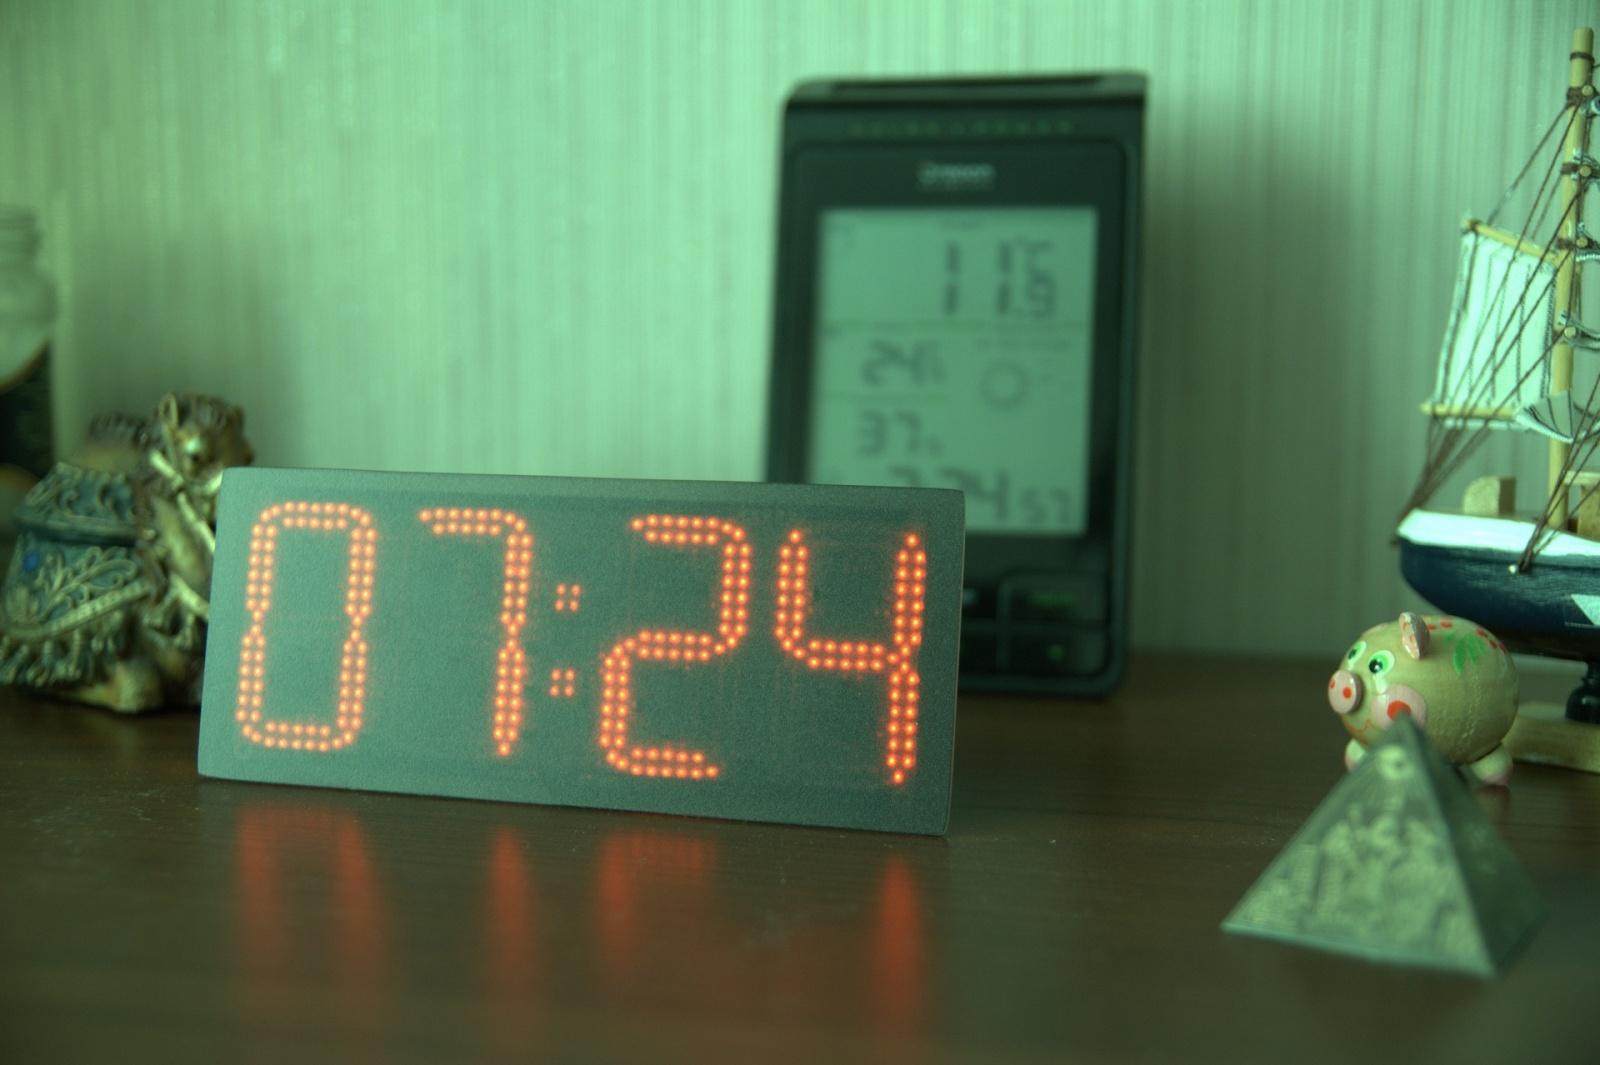 Ещё одни часы с WiFi. Clock380 - 21